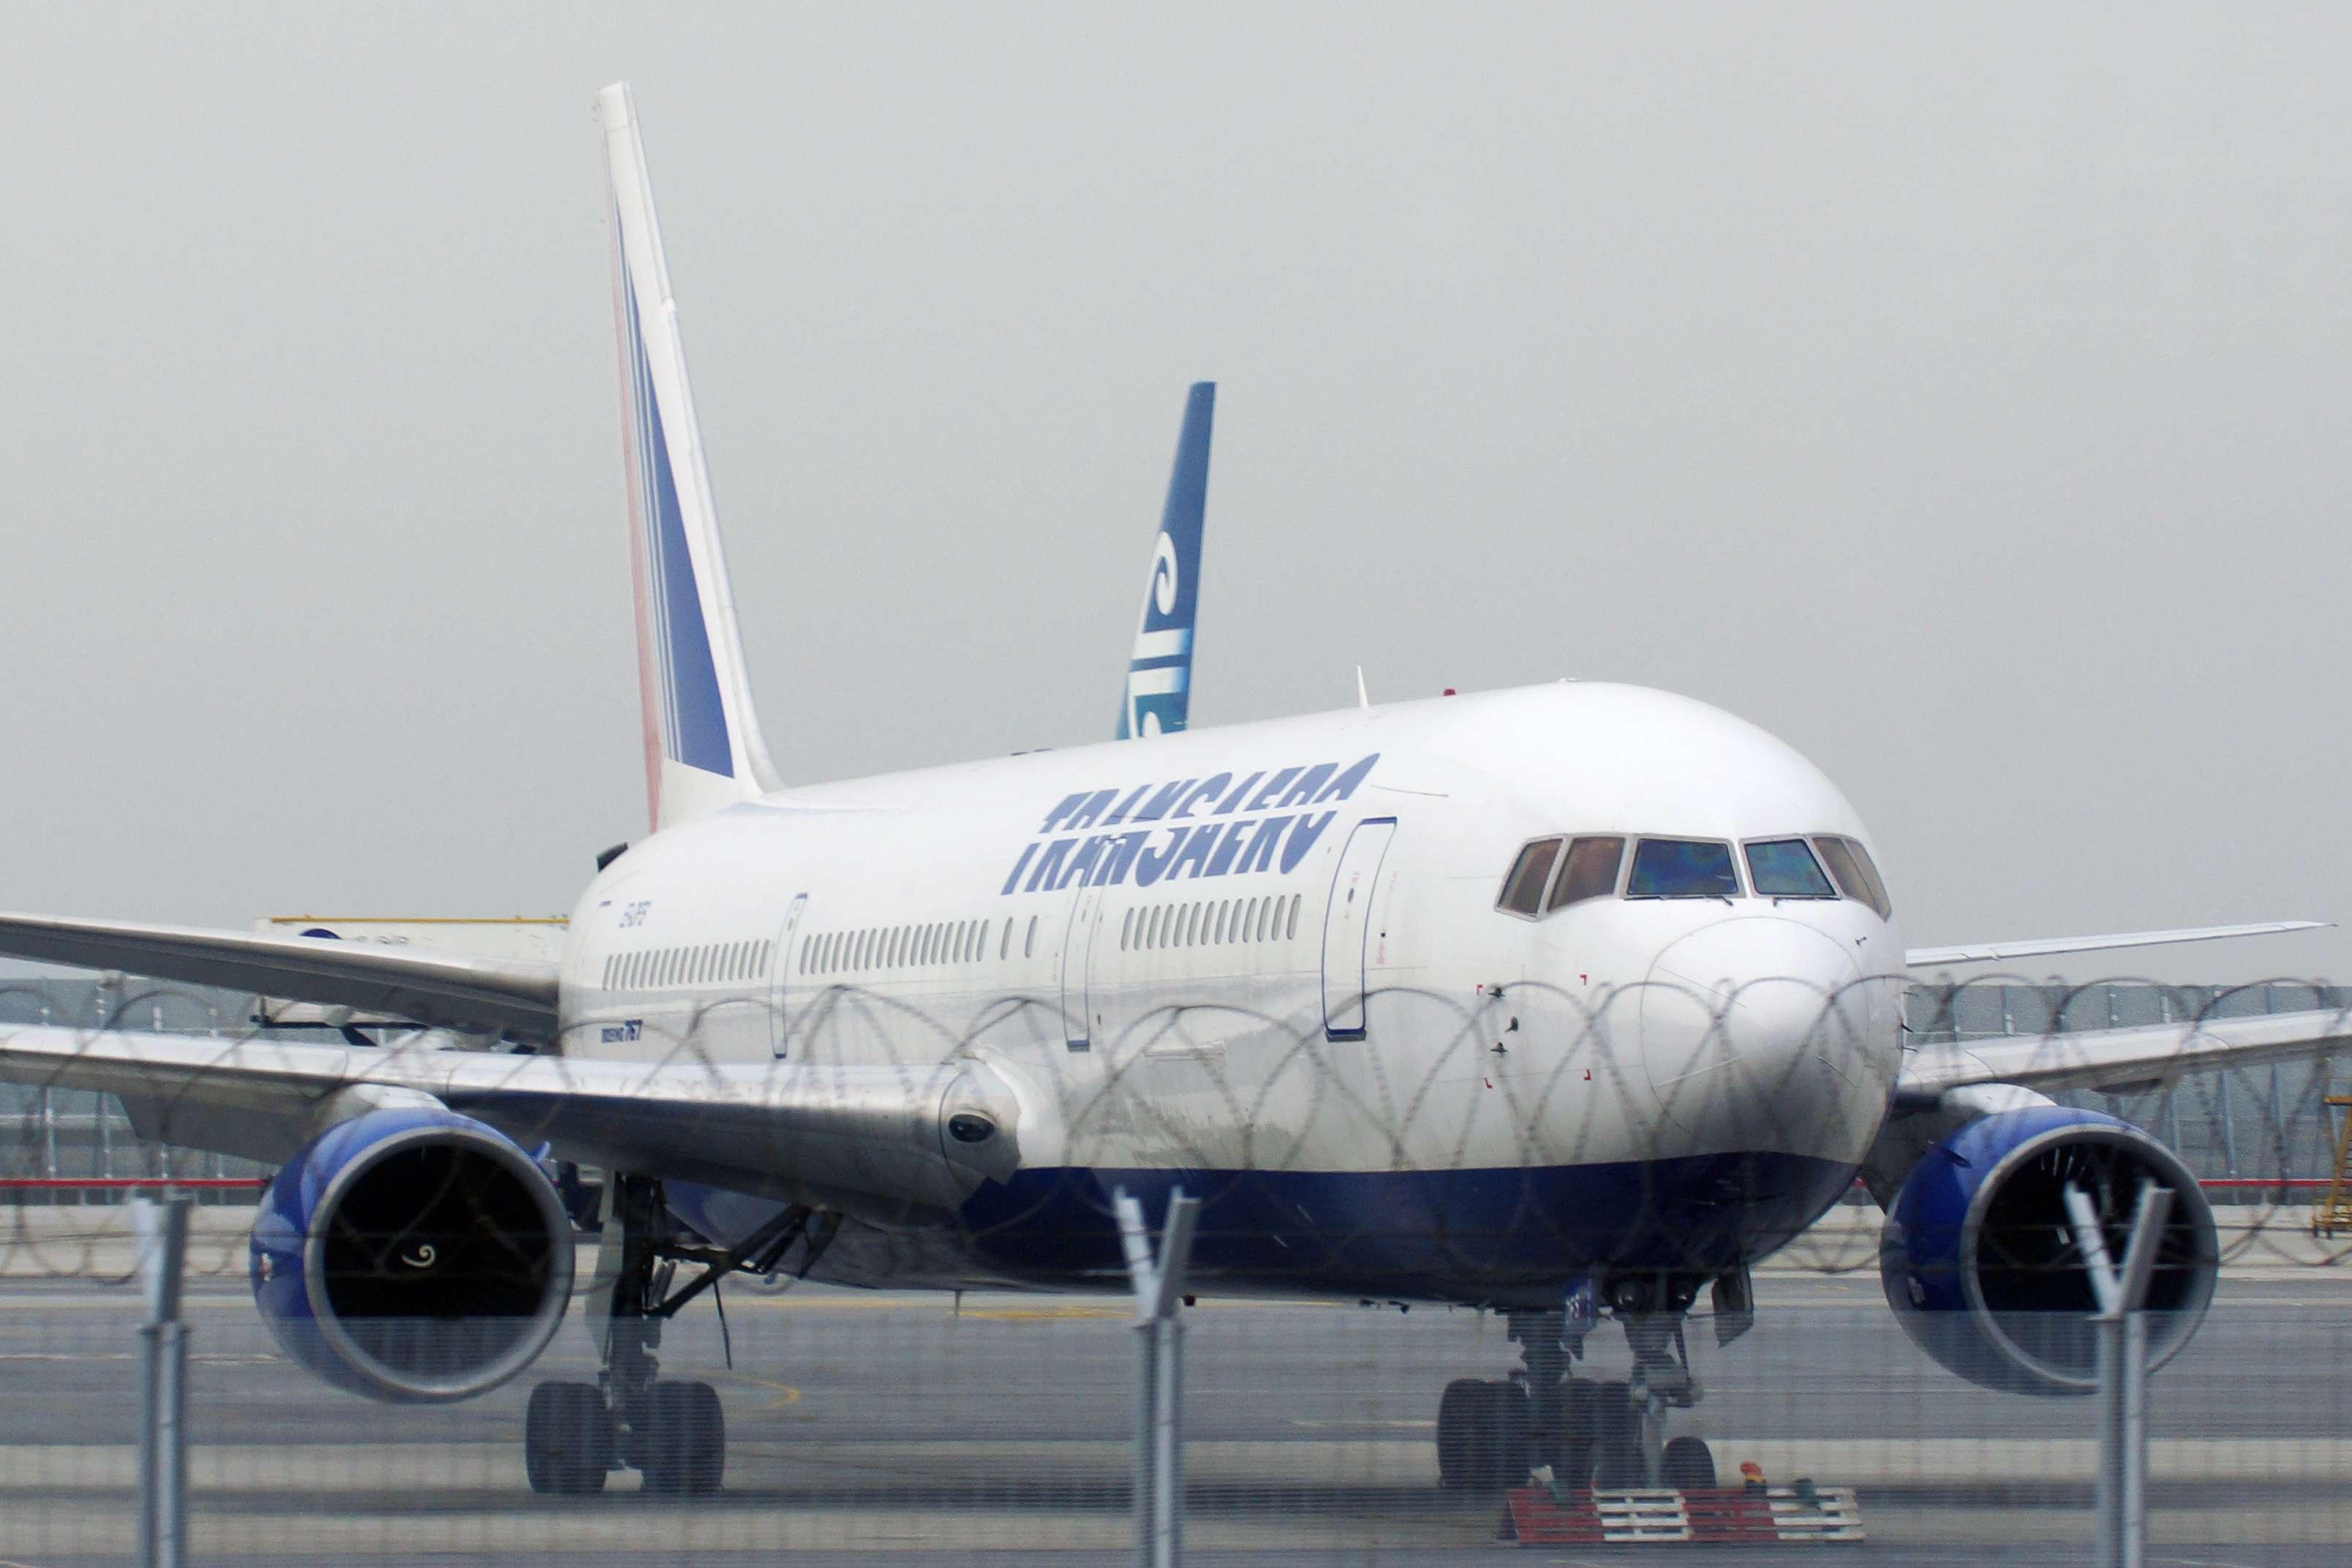 Boeing 747 plane abandoned in Hong Kong faces scrapyard but